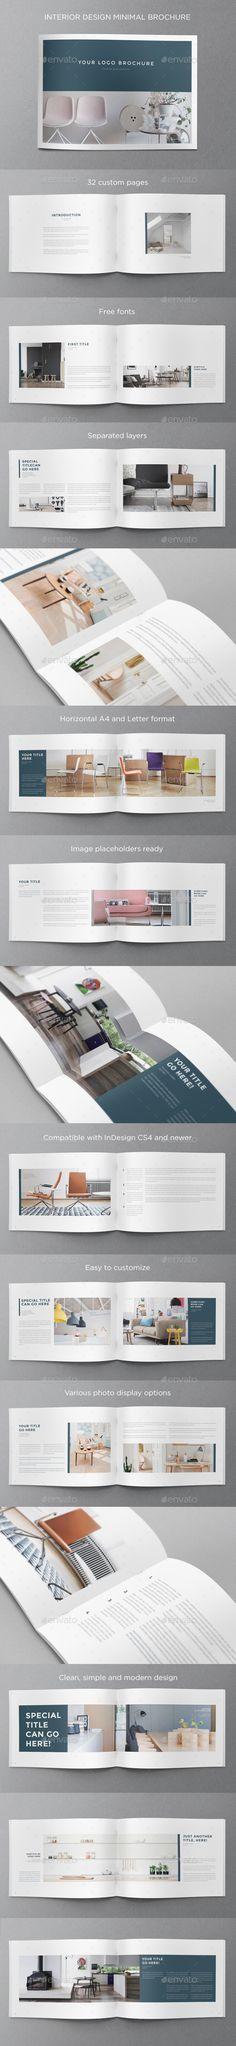 Interior Design Minimal Brochure — InDesign INDD #modern #minimal • Available here → https://graphicriver.net/item/interior-design-minimal-brochure/11243000?ref=pxcr